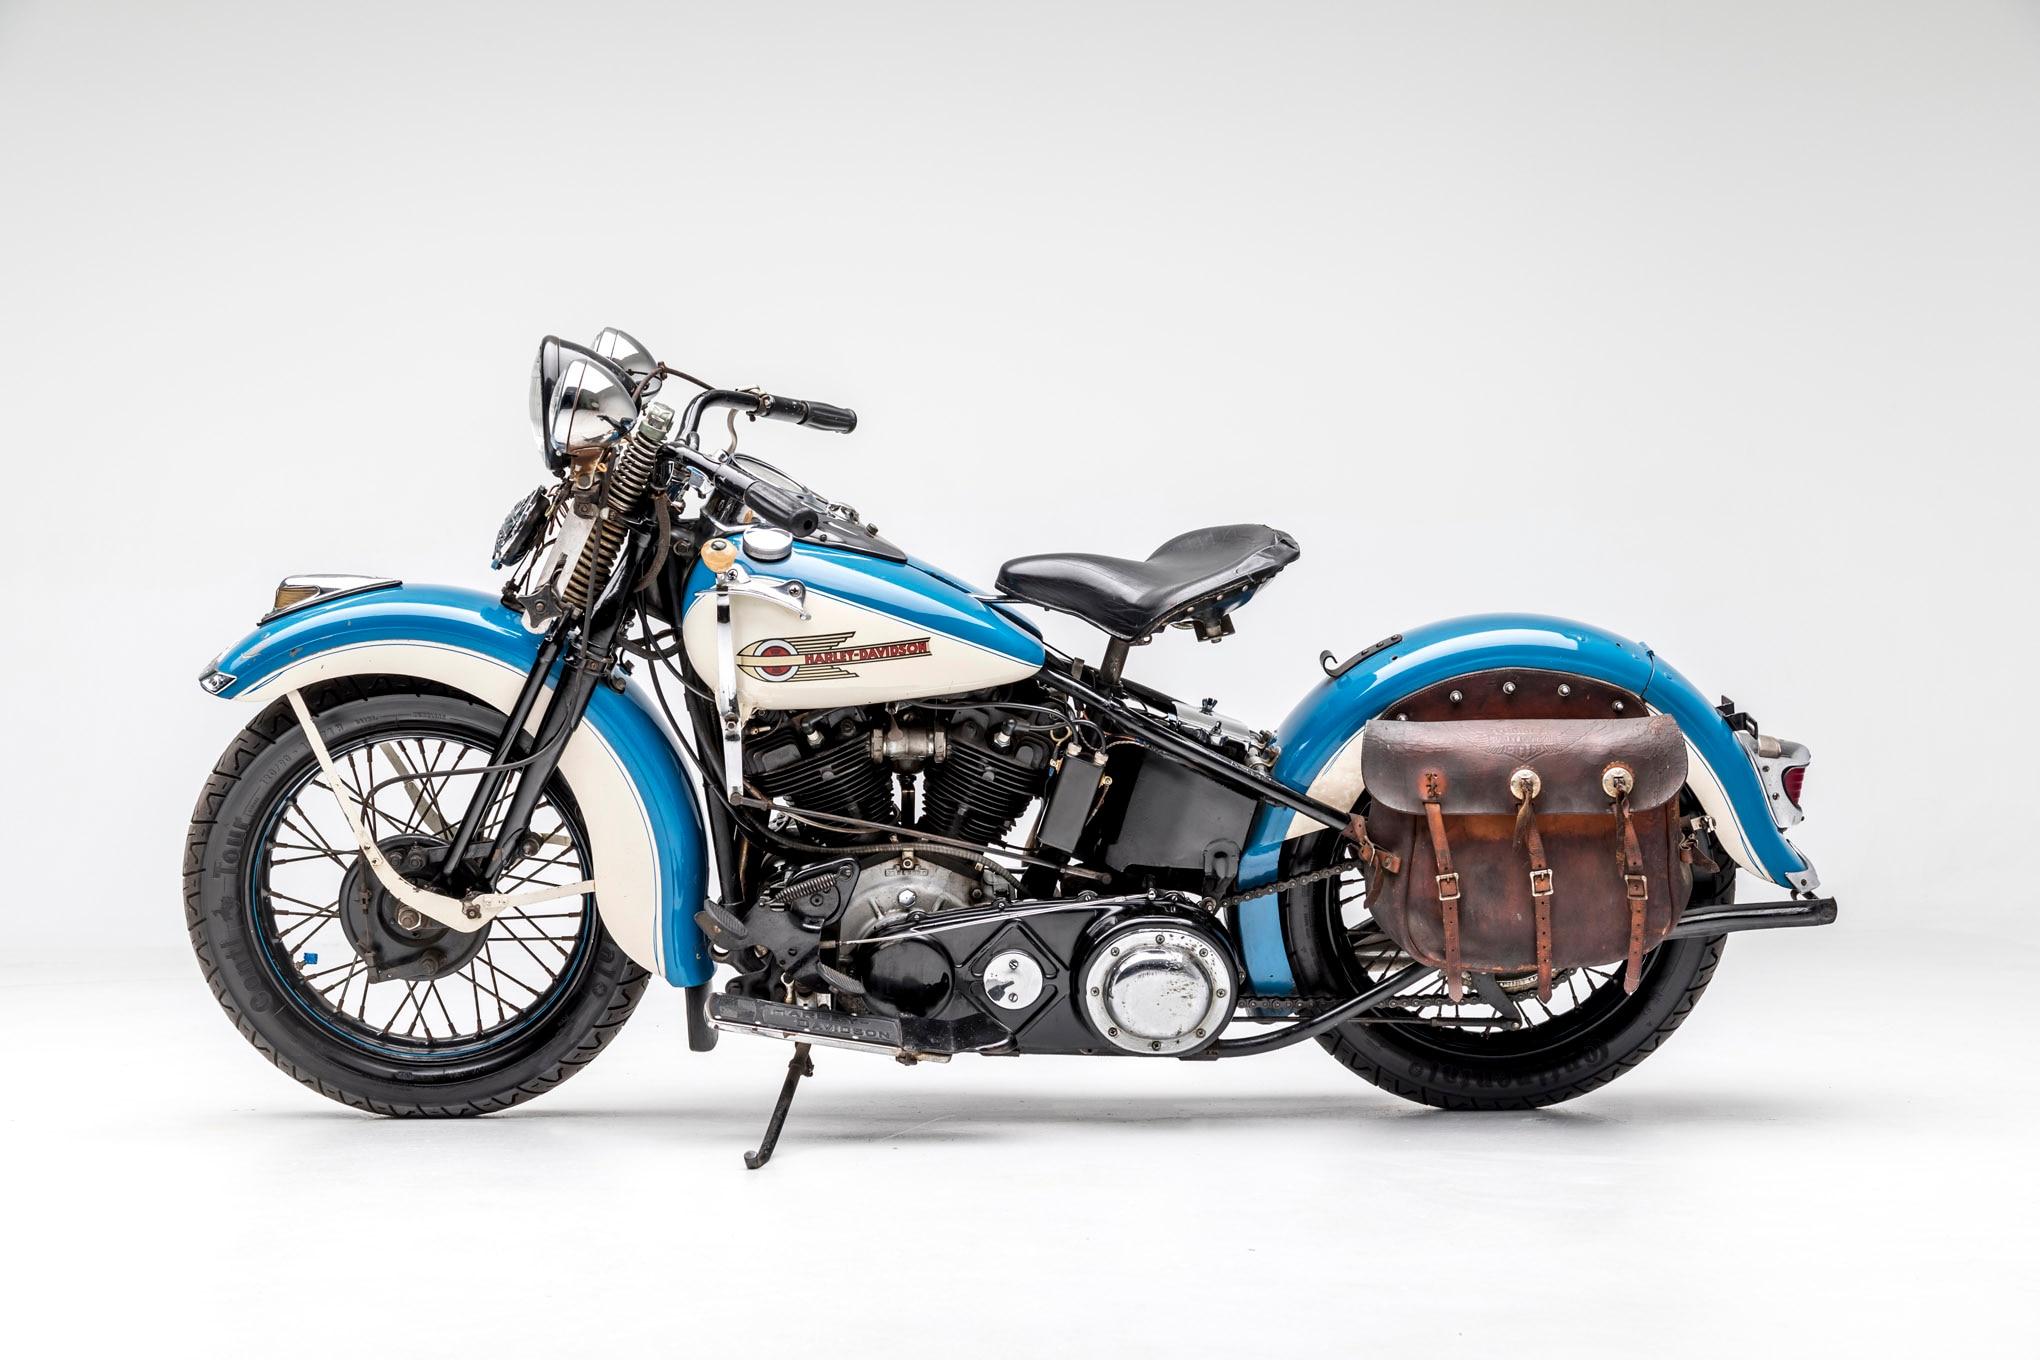 Mini Cooper Sportster >> Indian Scout Versus Harley Davidson Sportster Harley | Autos Post